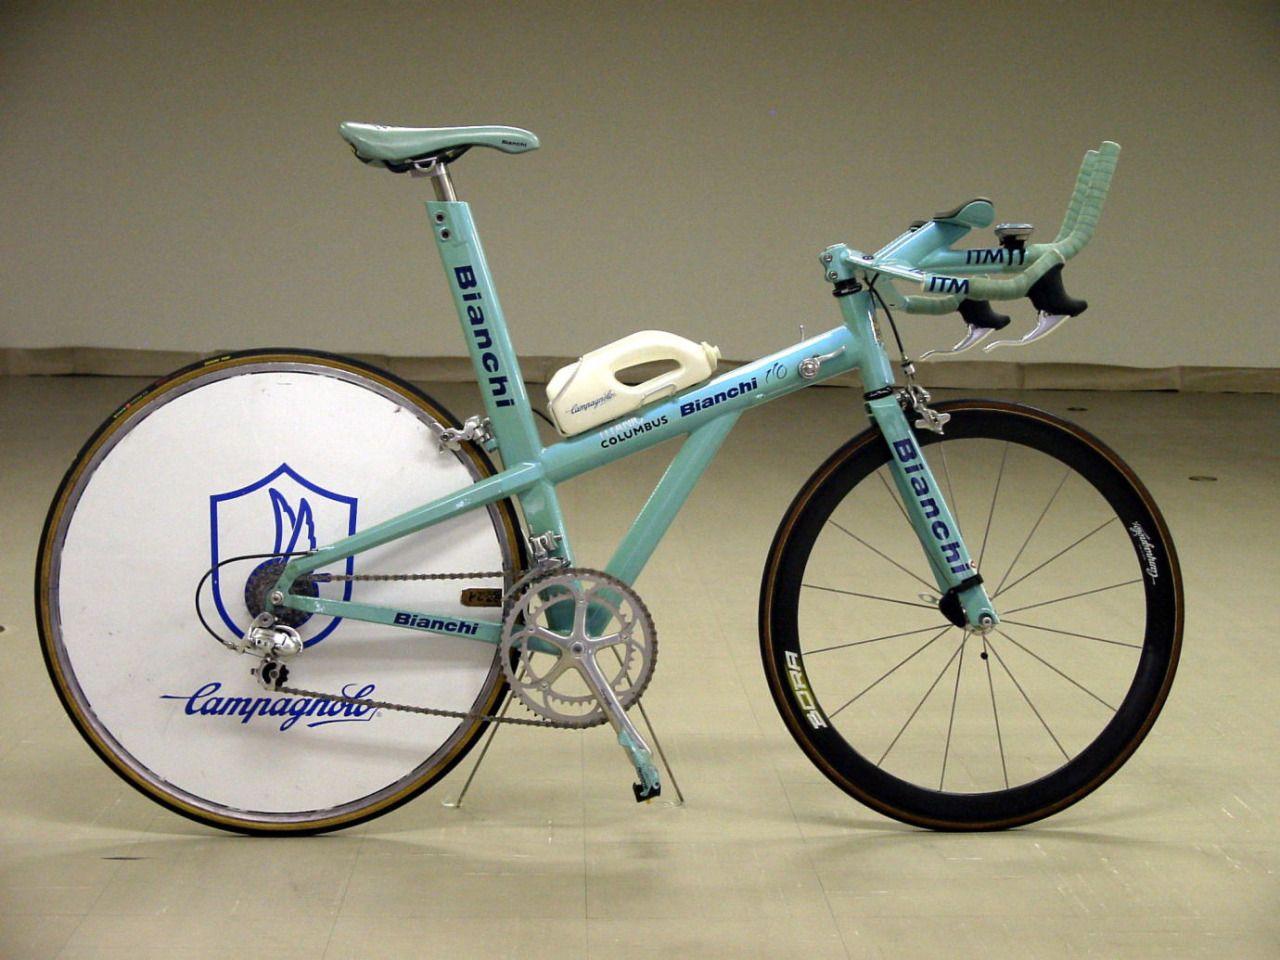 5f1e4c88a83 Evgueni Berzin's Bianchi (1997) Titanium Bike, Vintage Bicycles, Retro  Bicycle, Old